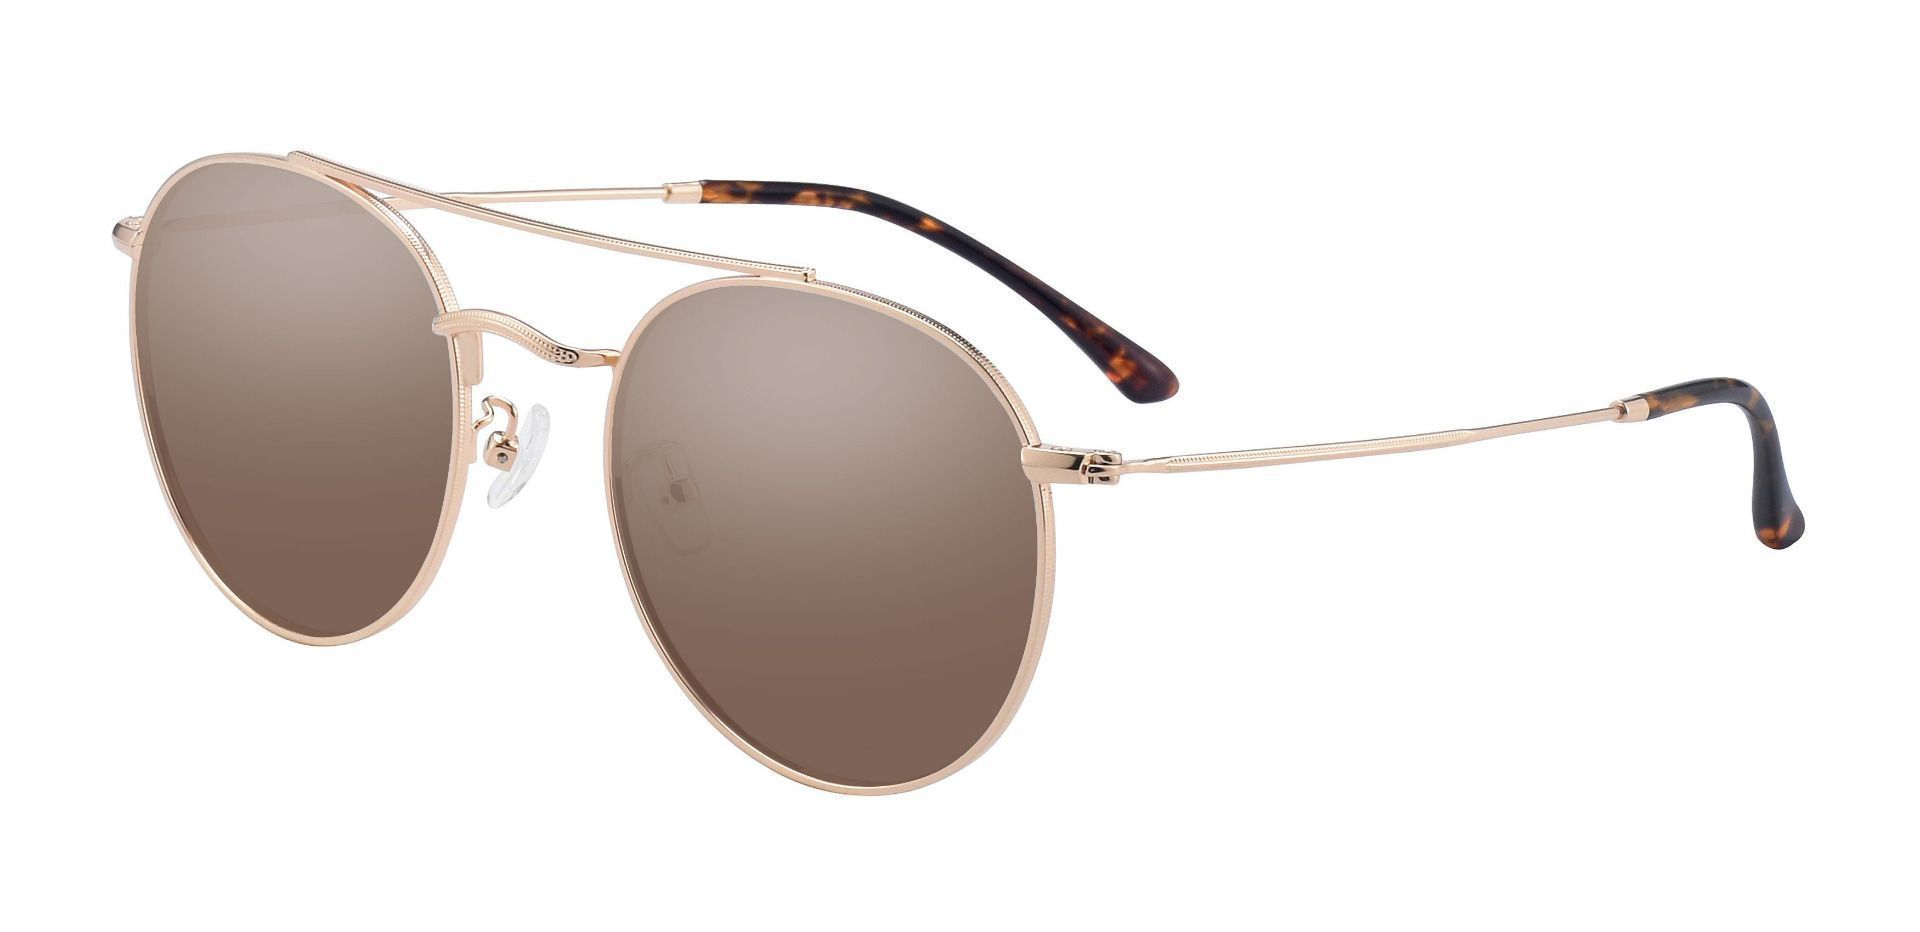 Malik Aviator Prescription Sunglasses - Gold Frame With Brown Lenses